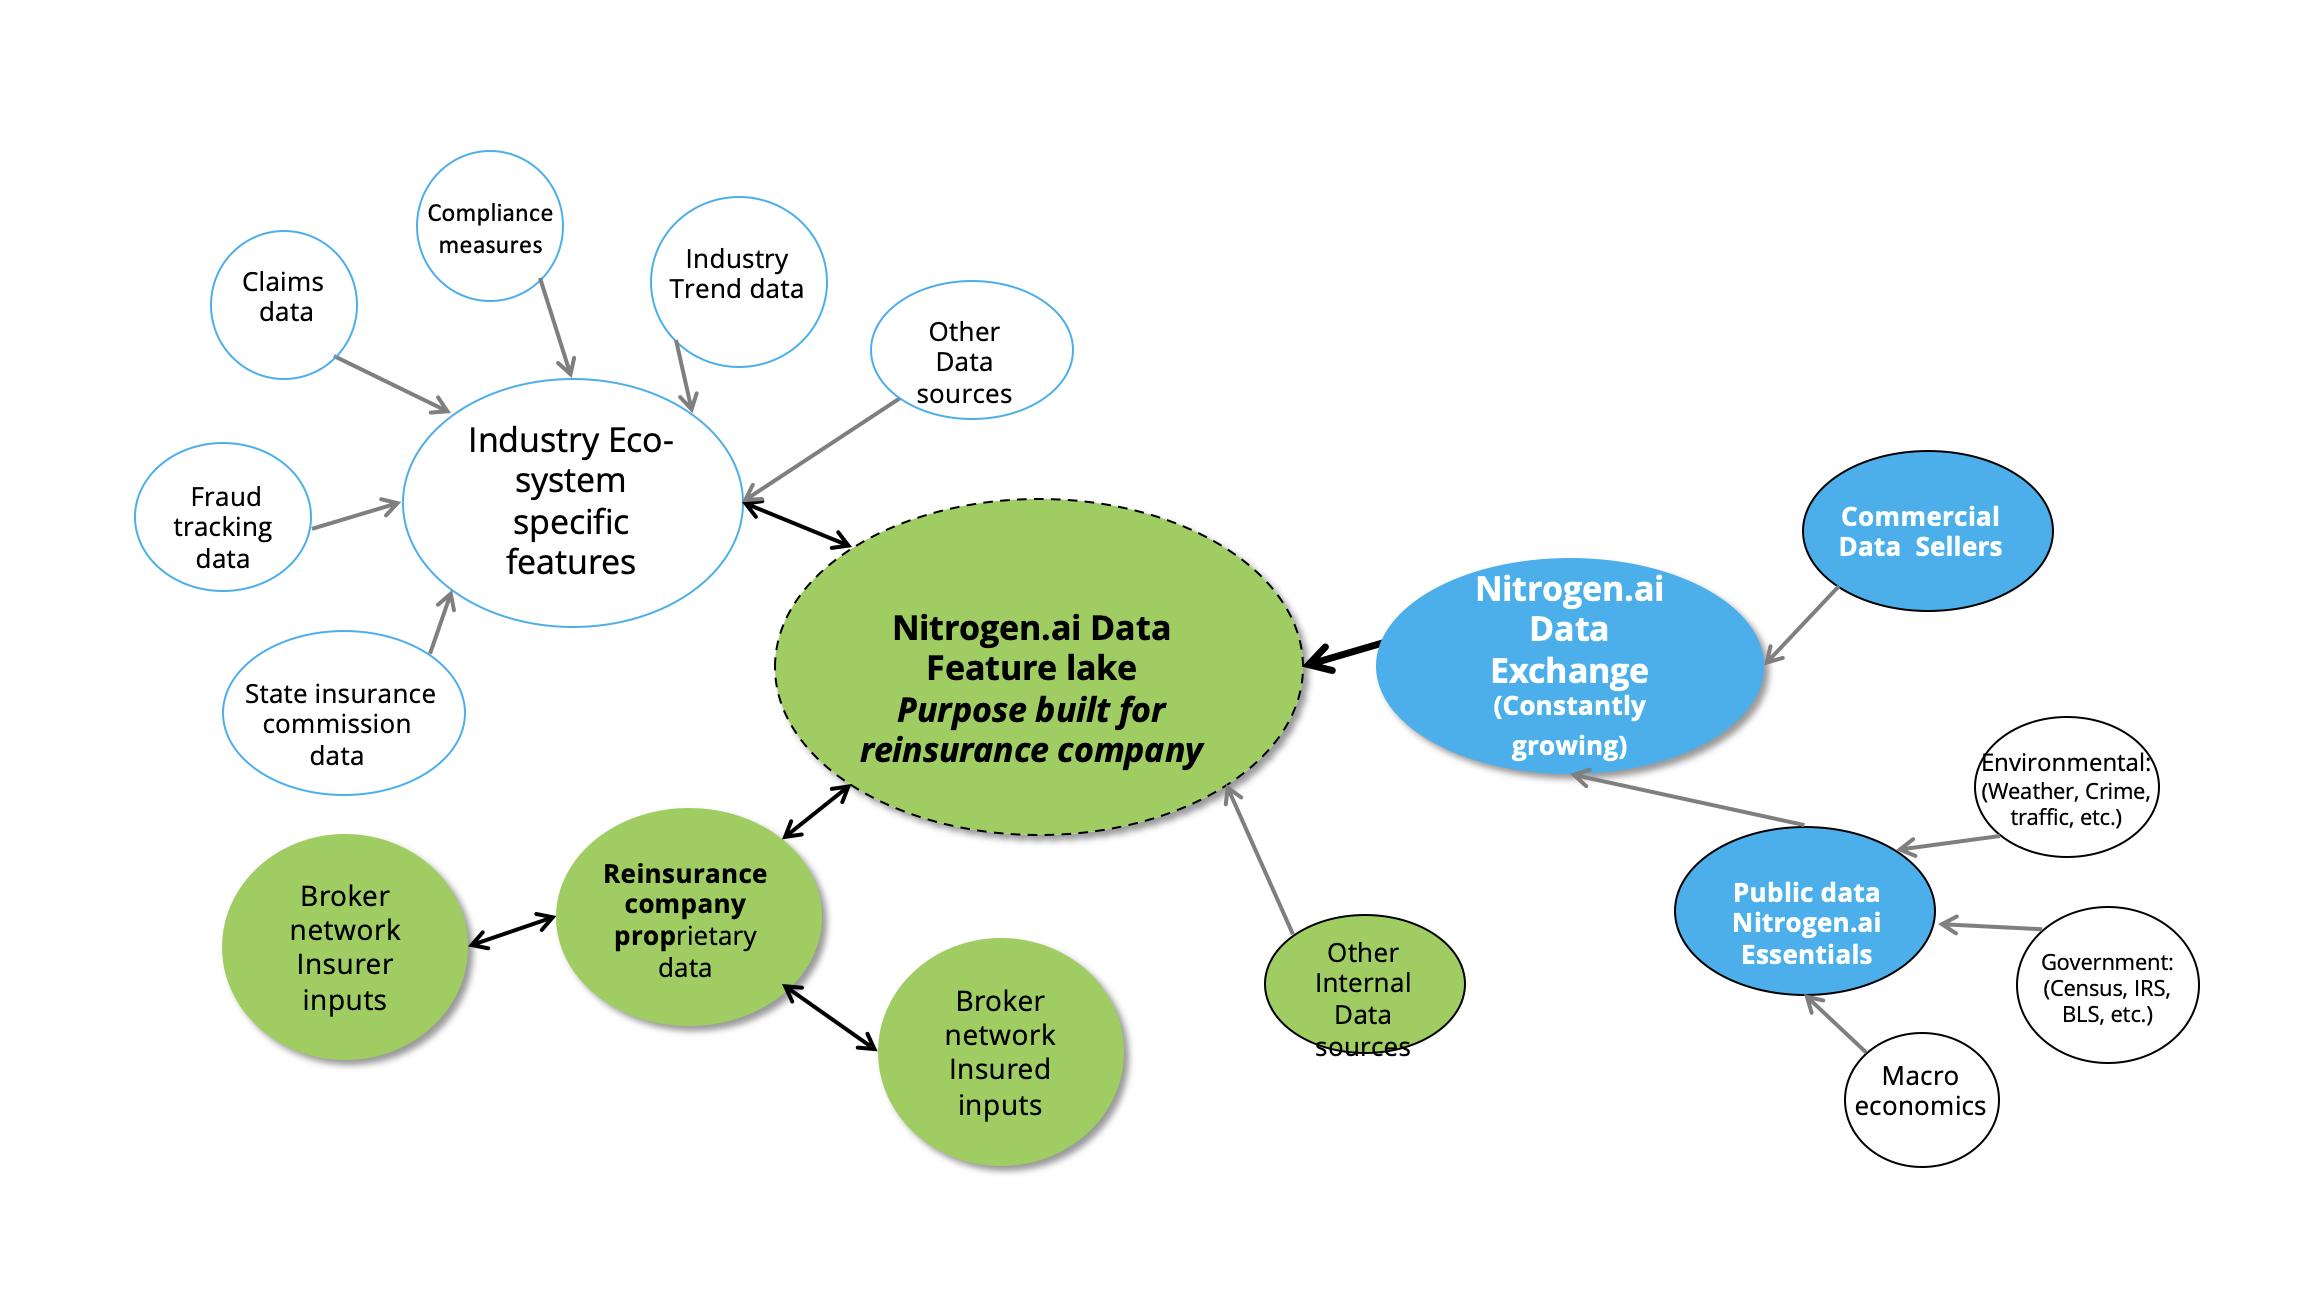 reinsurance company data feature lake